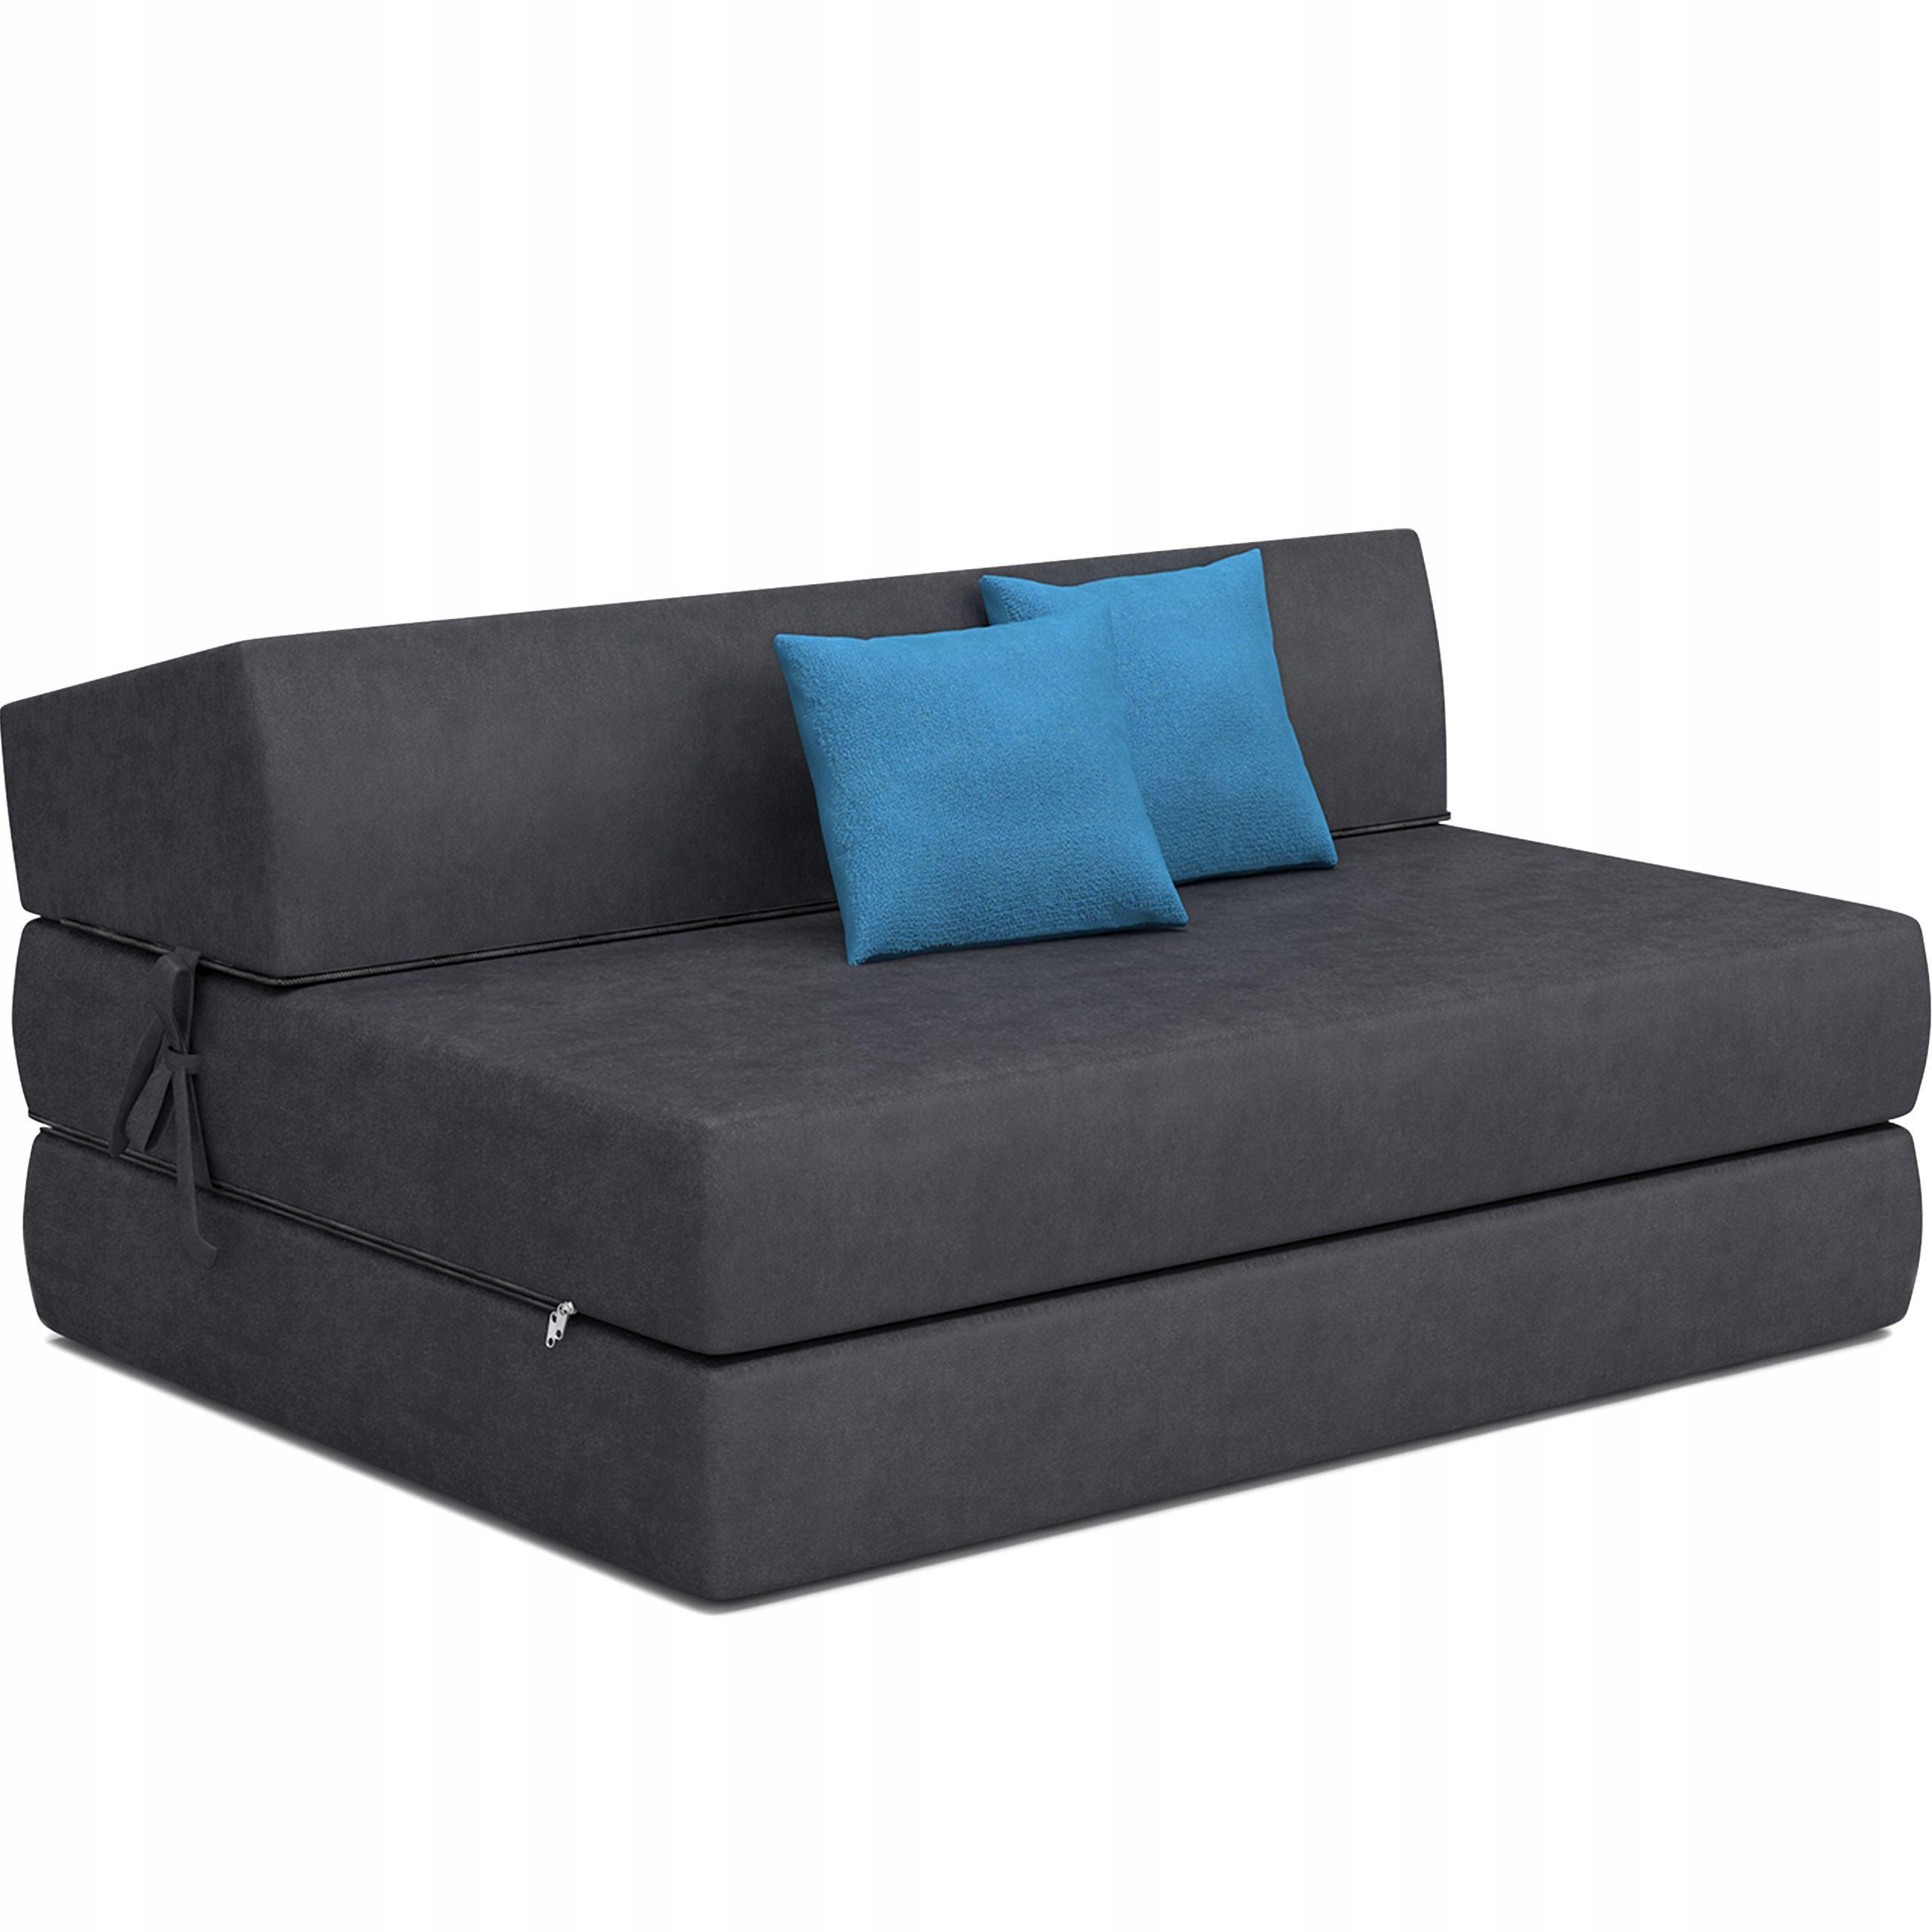 Fotel Kanapa Rozkladany Materac Sofa Z Poduszkami Furniture Storage Bench Decor